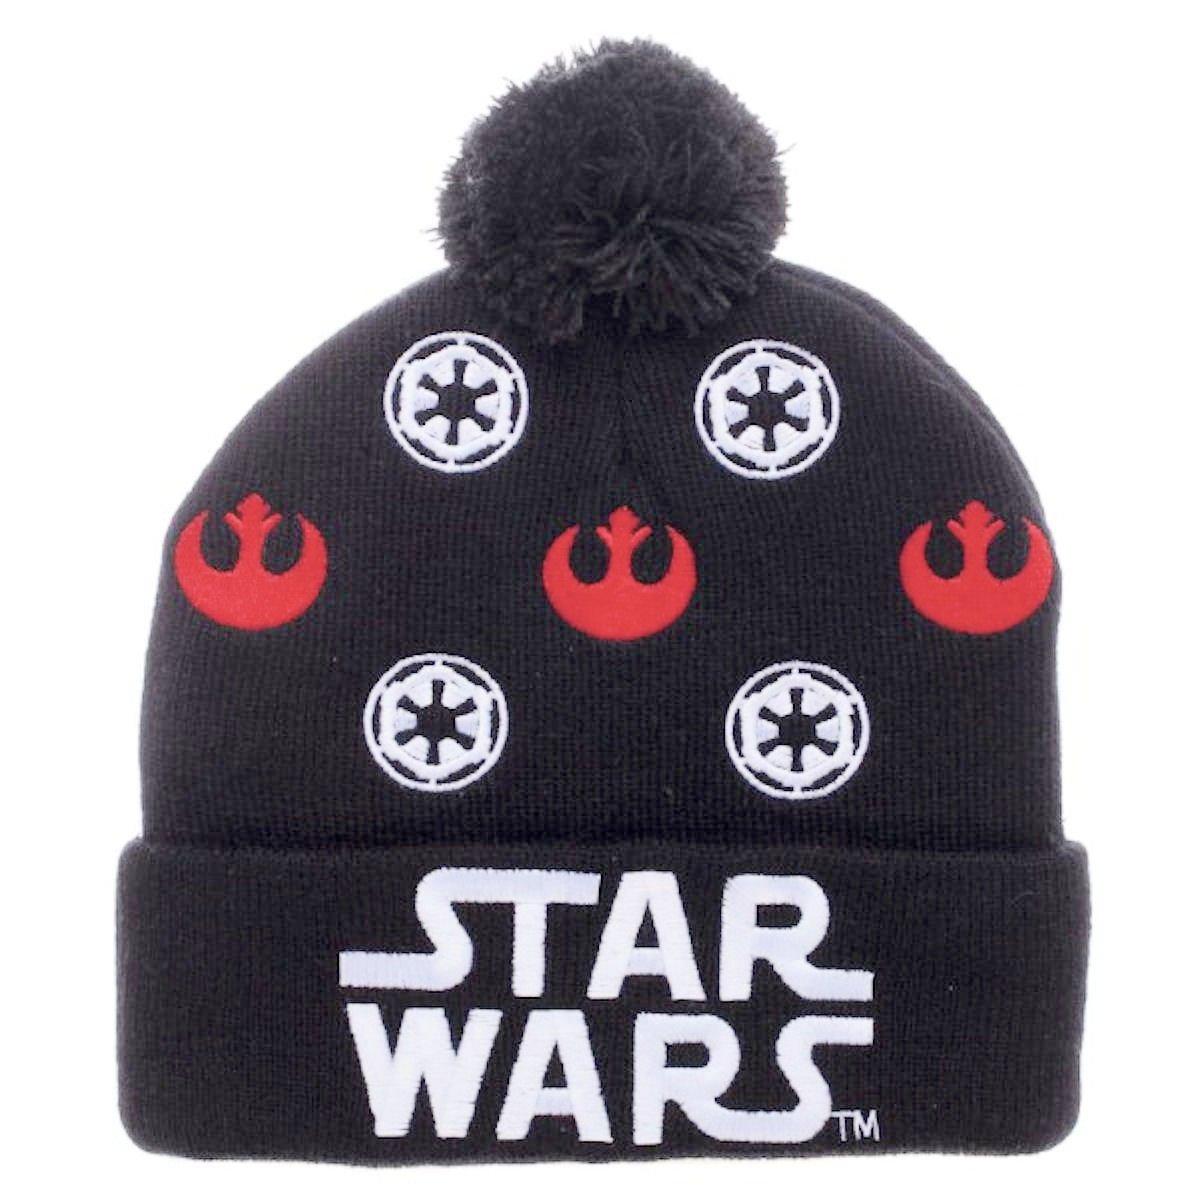 Star Wars Logo Rebel Alliance/Galactic Empire Cuff Pom Beanie Bioworld KC4GKQSTW